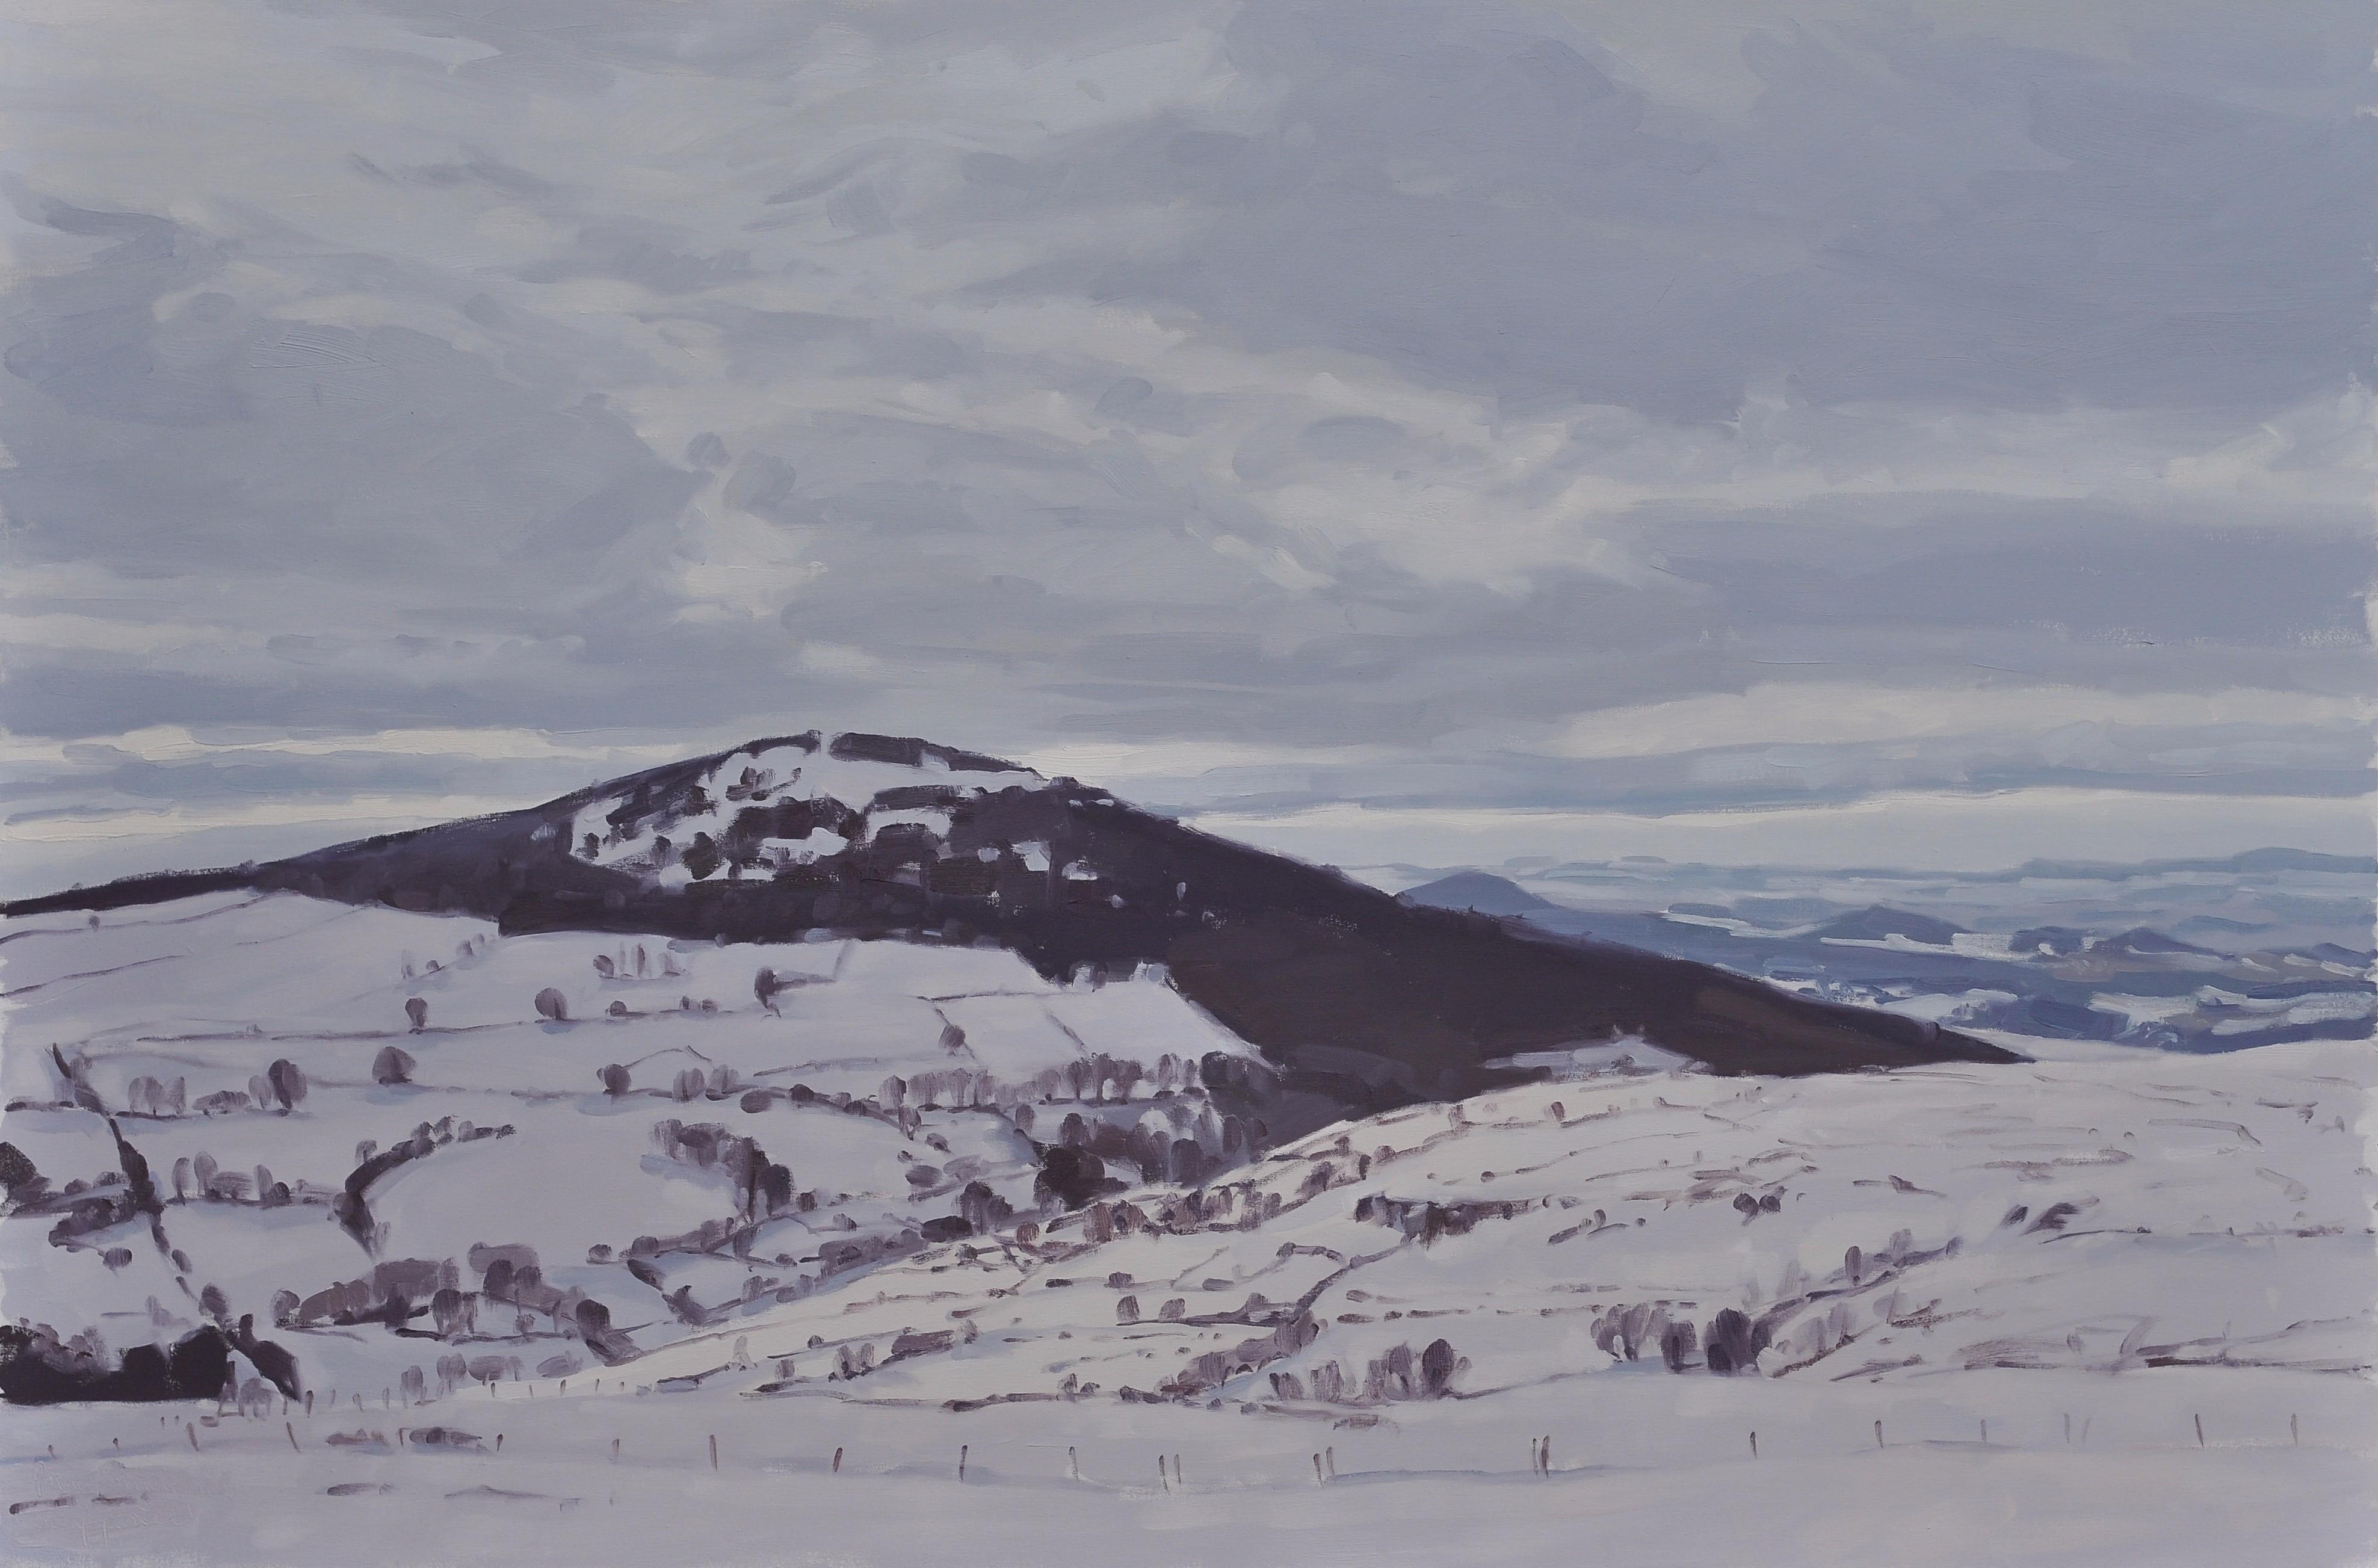 Neuf février, Massif du Mézenc - Anne Baudequin - KAZoART